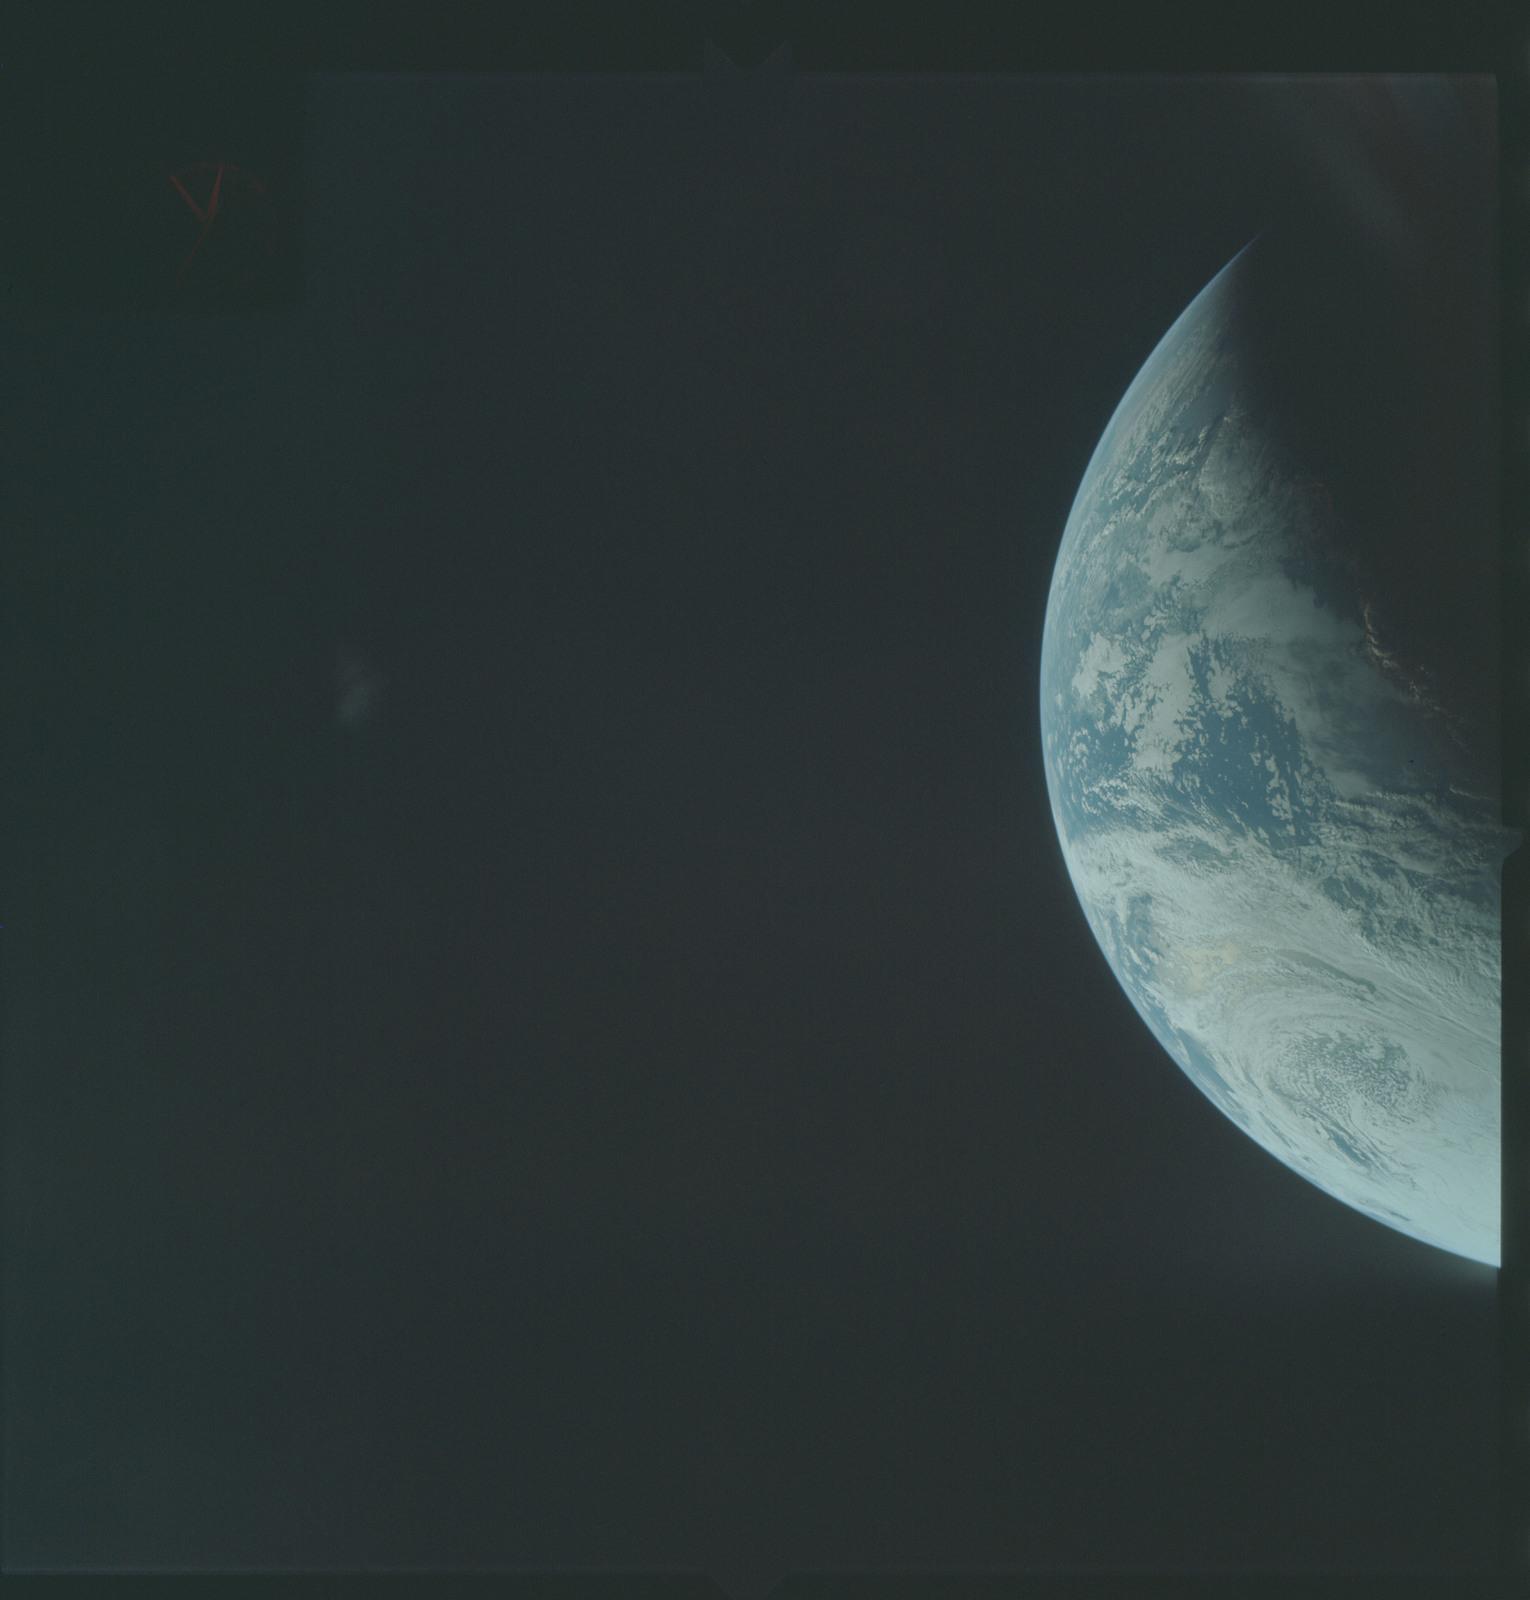 AS04-01-230 - Apollo 4 - Apollo 4 Mission - Atlantic Ocean,coastal Brazil and West Africa